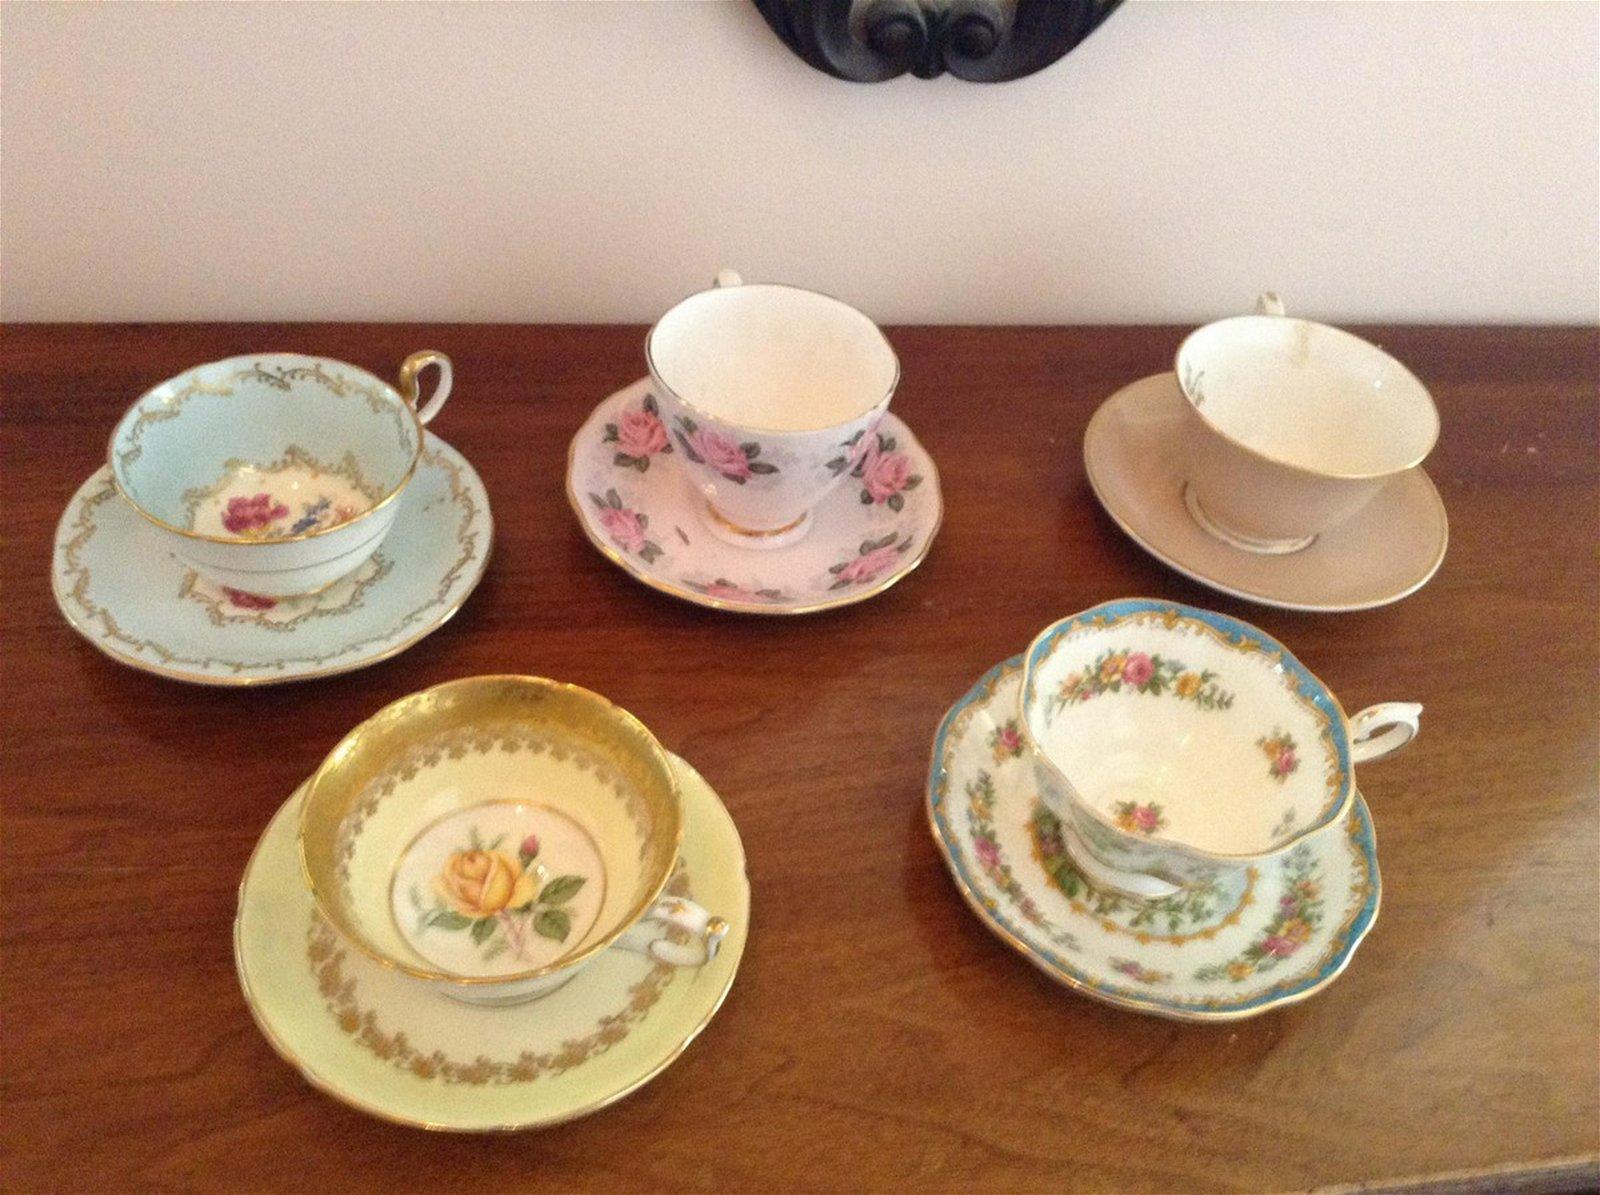 lot of 5 vintage tea cups and saucers Colclough,